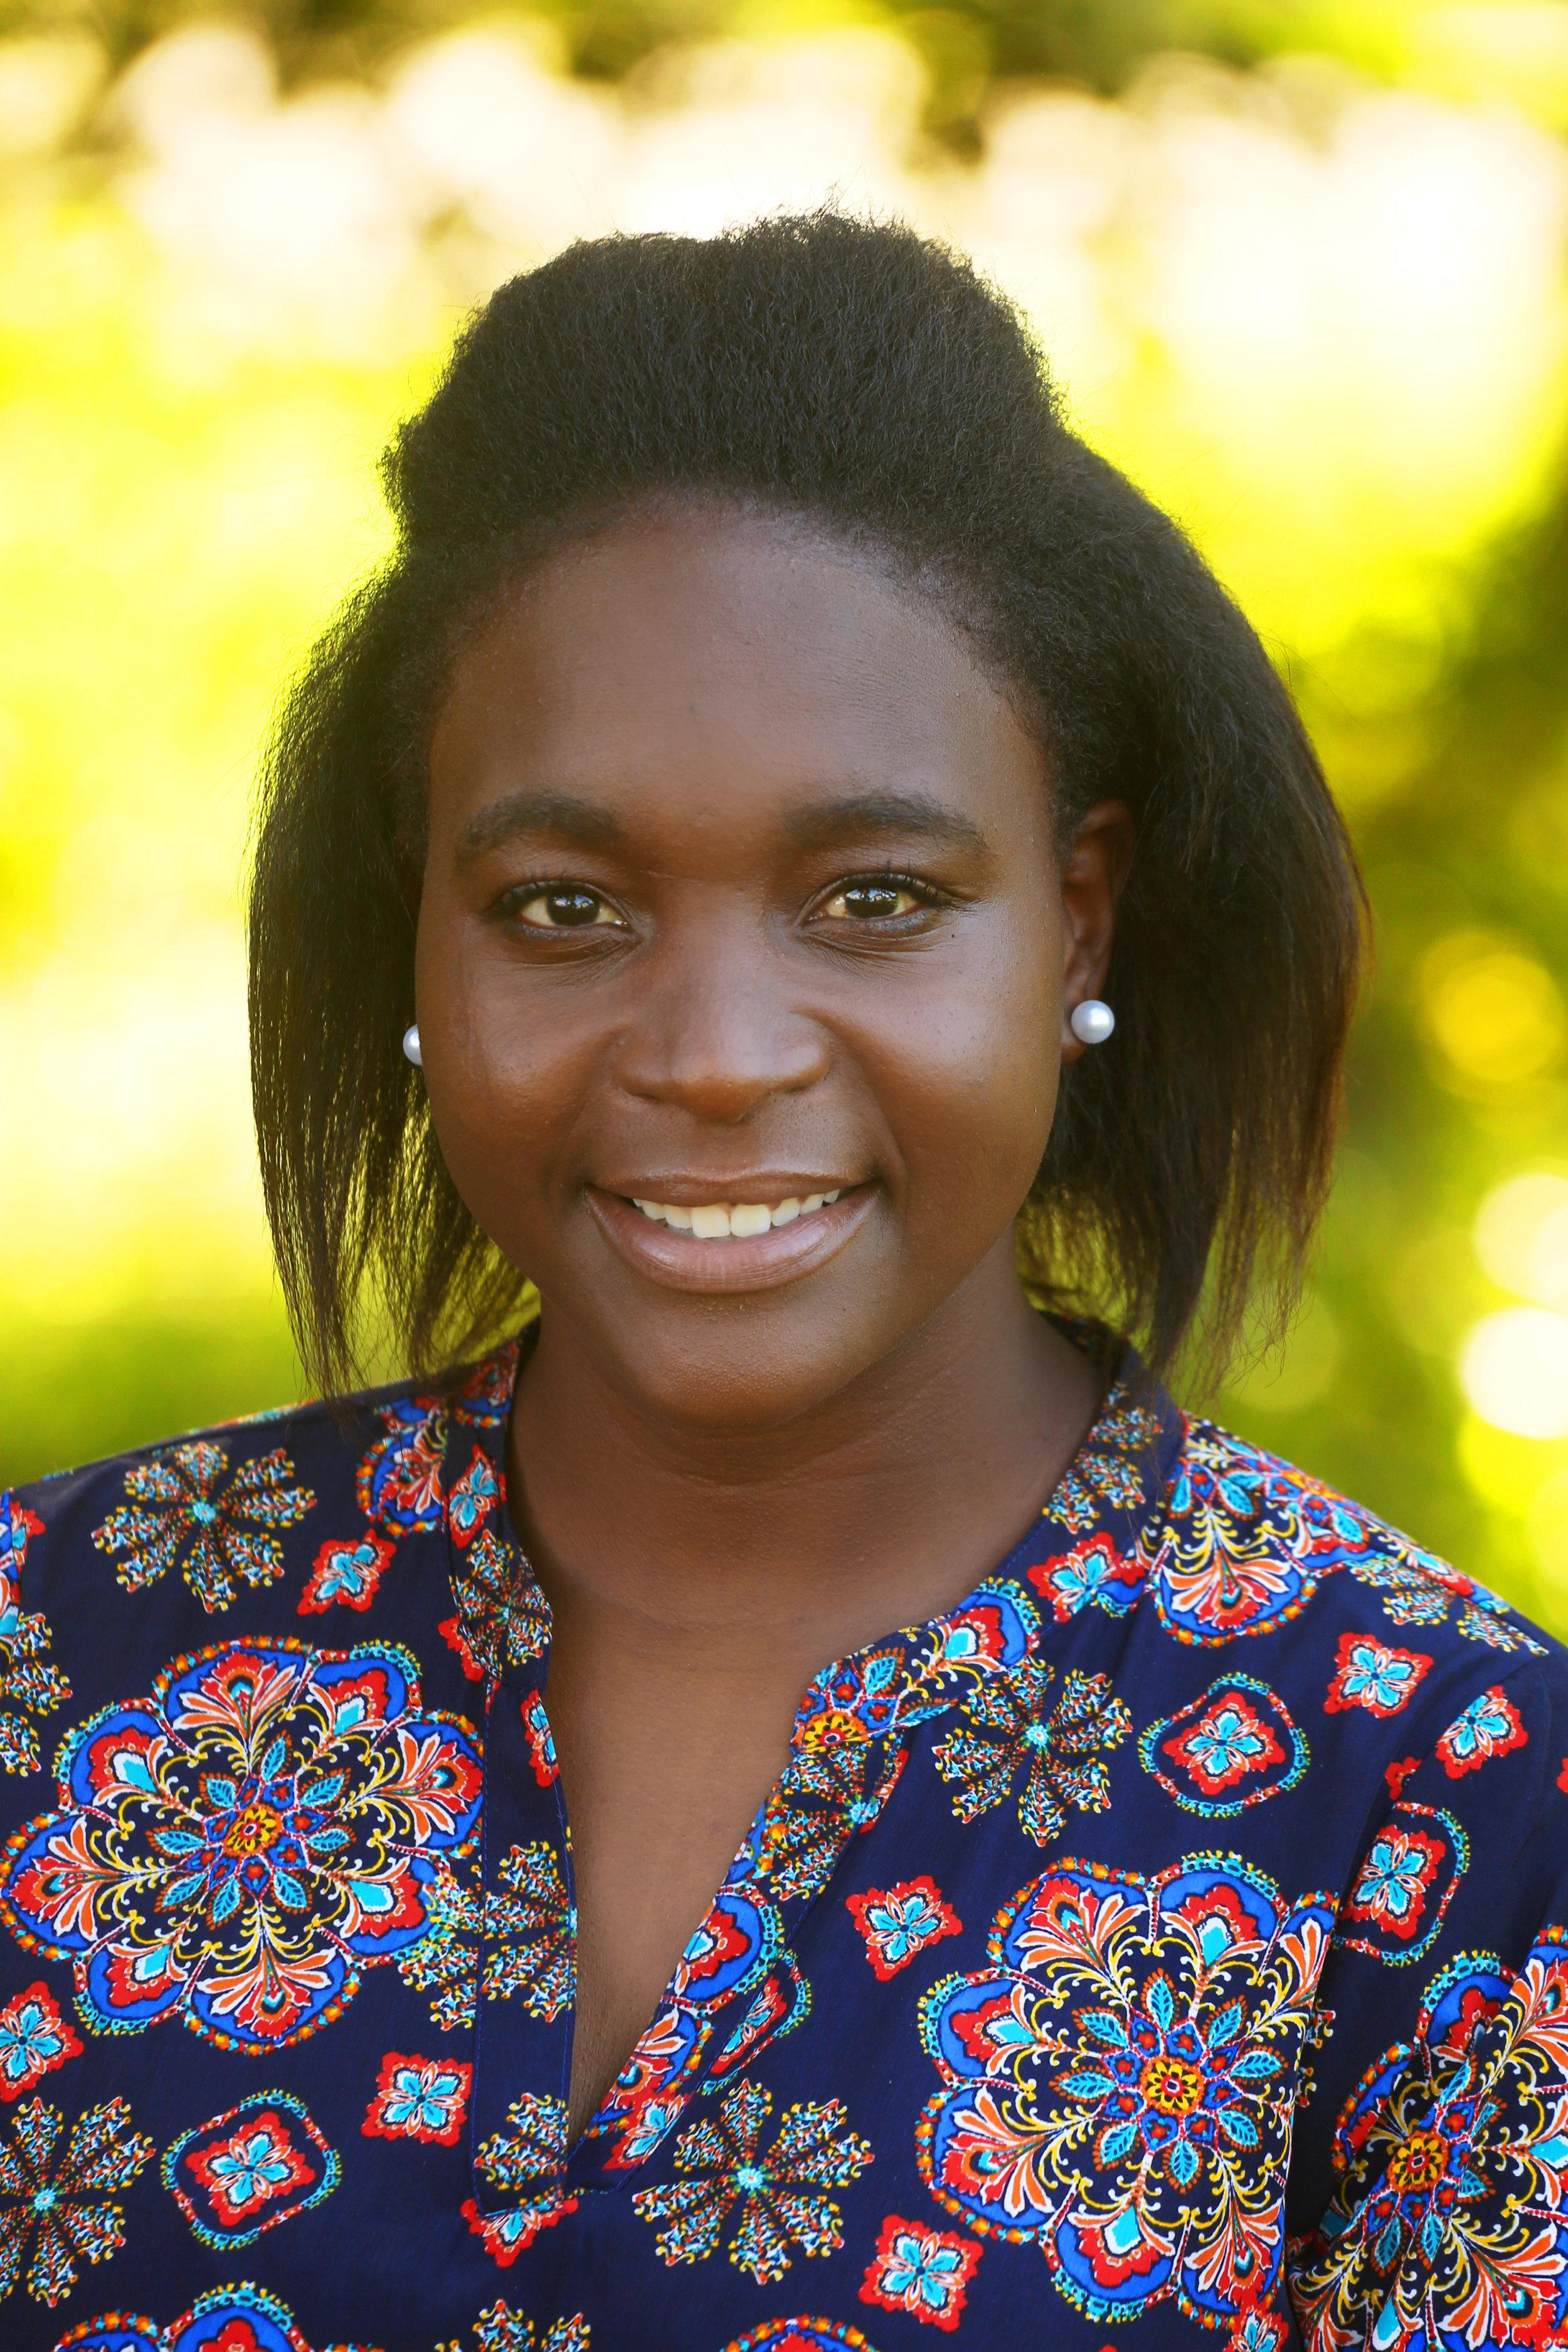 Ms. Kimberly Reynolds Academic Advisor kreynolds@oneschool.net